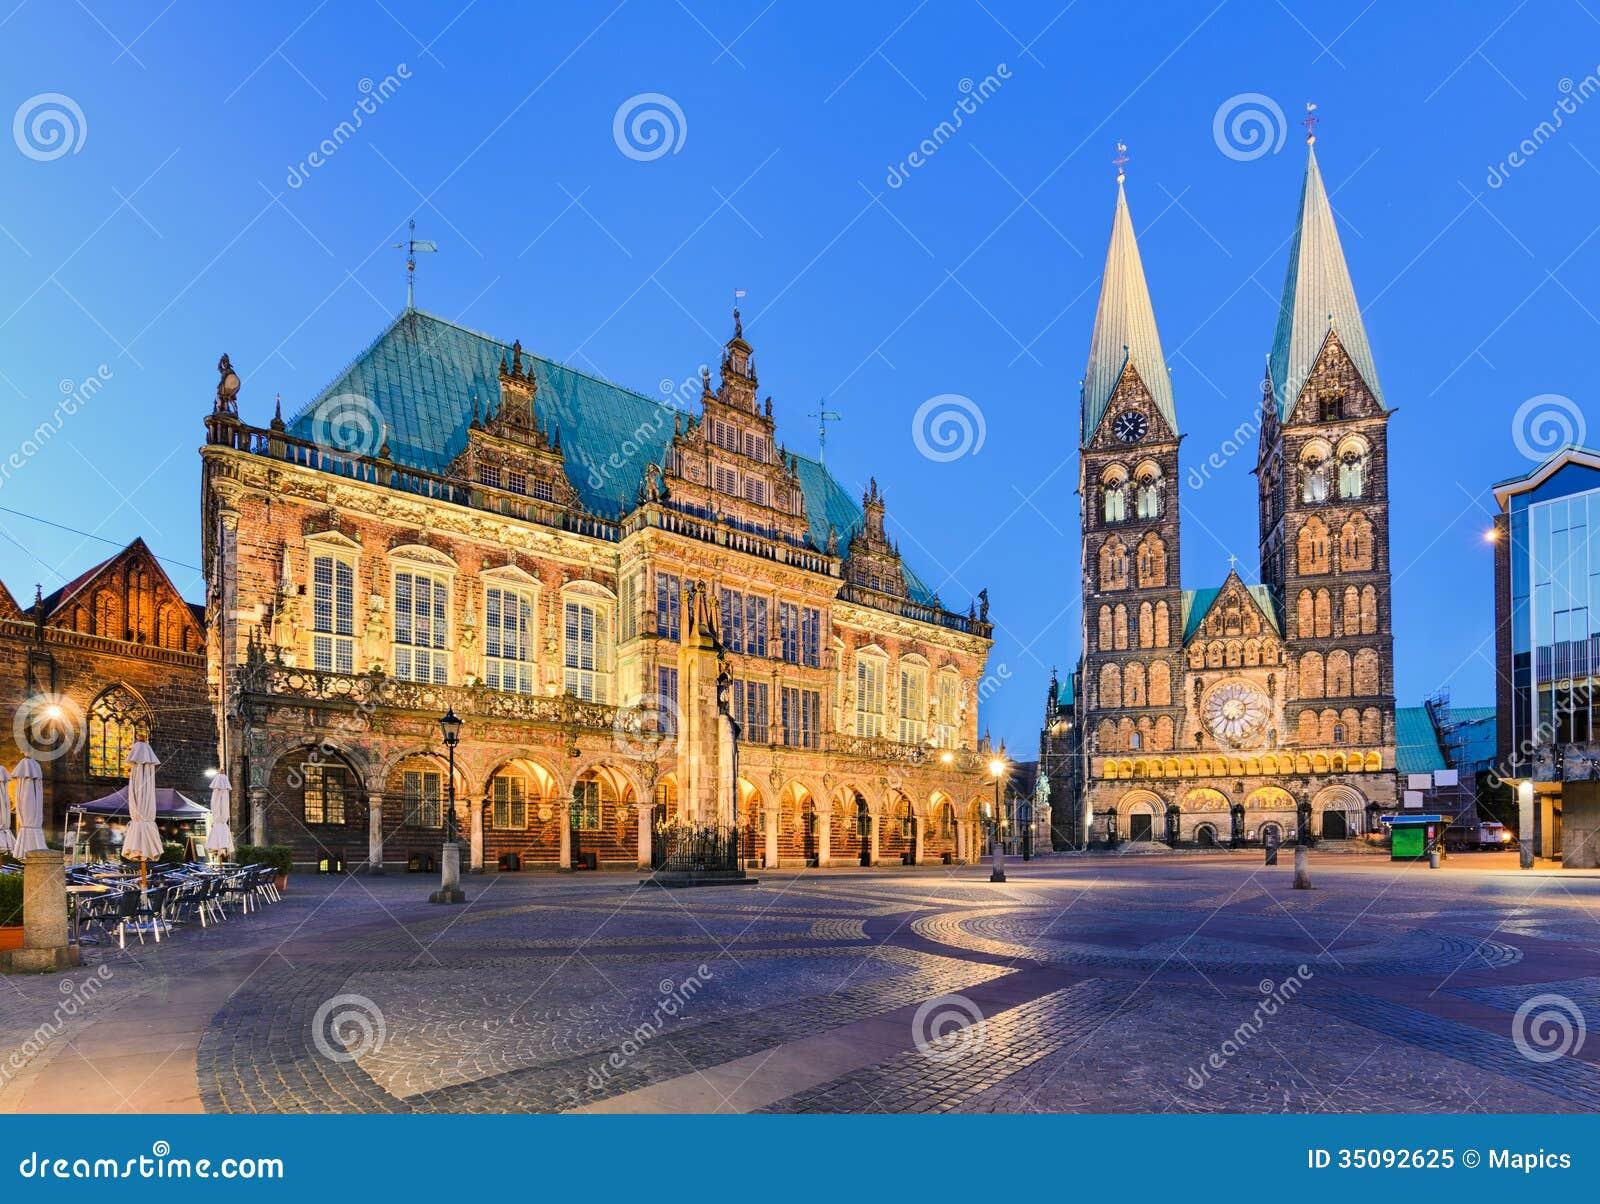 city hall and the cathedral of bremen germany stock image image of market marktplatz 35092625. Black Bedroom Furniture Sets. Home Design Ideas